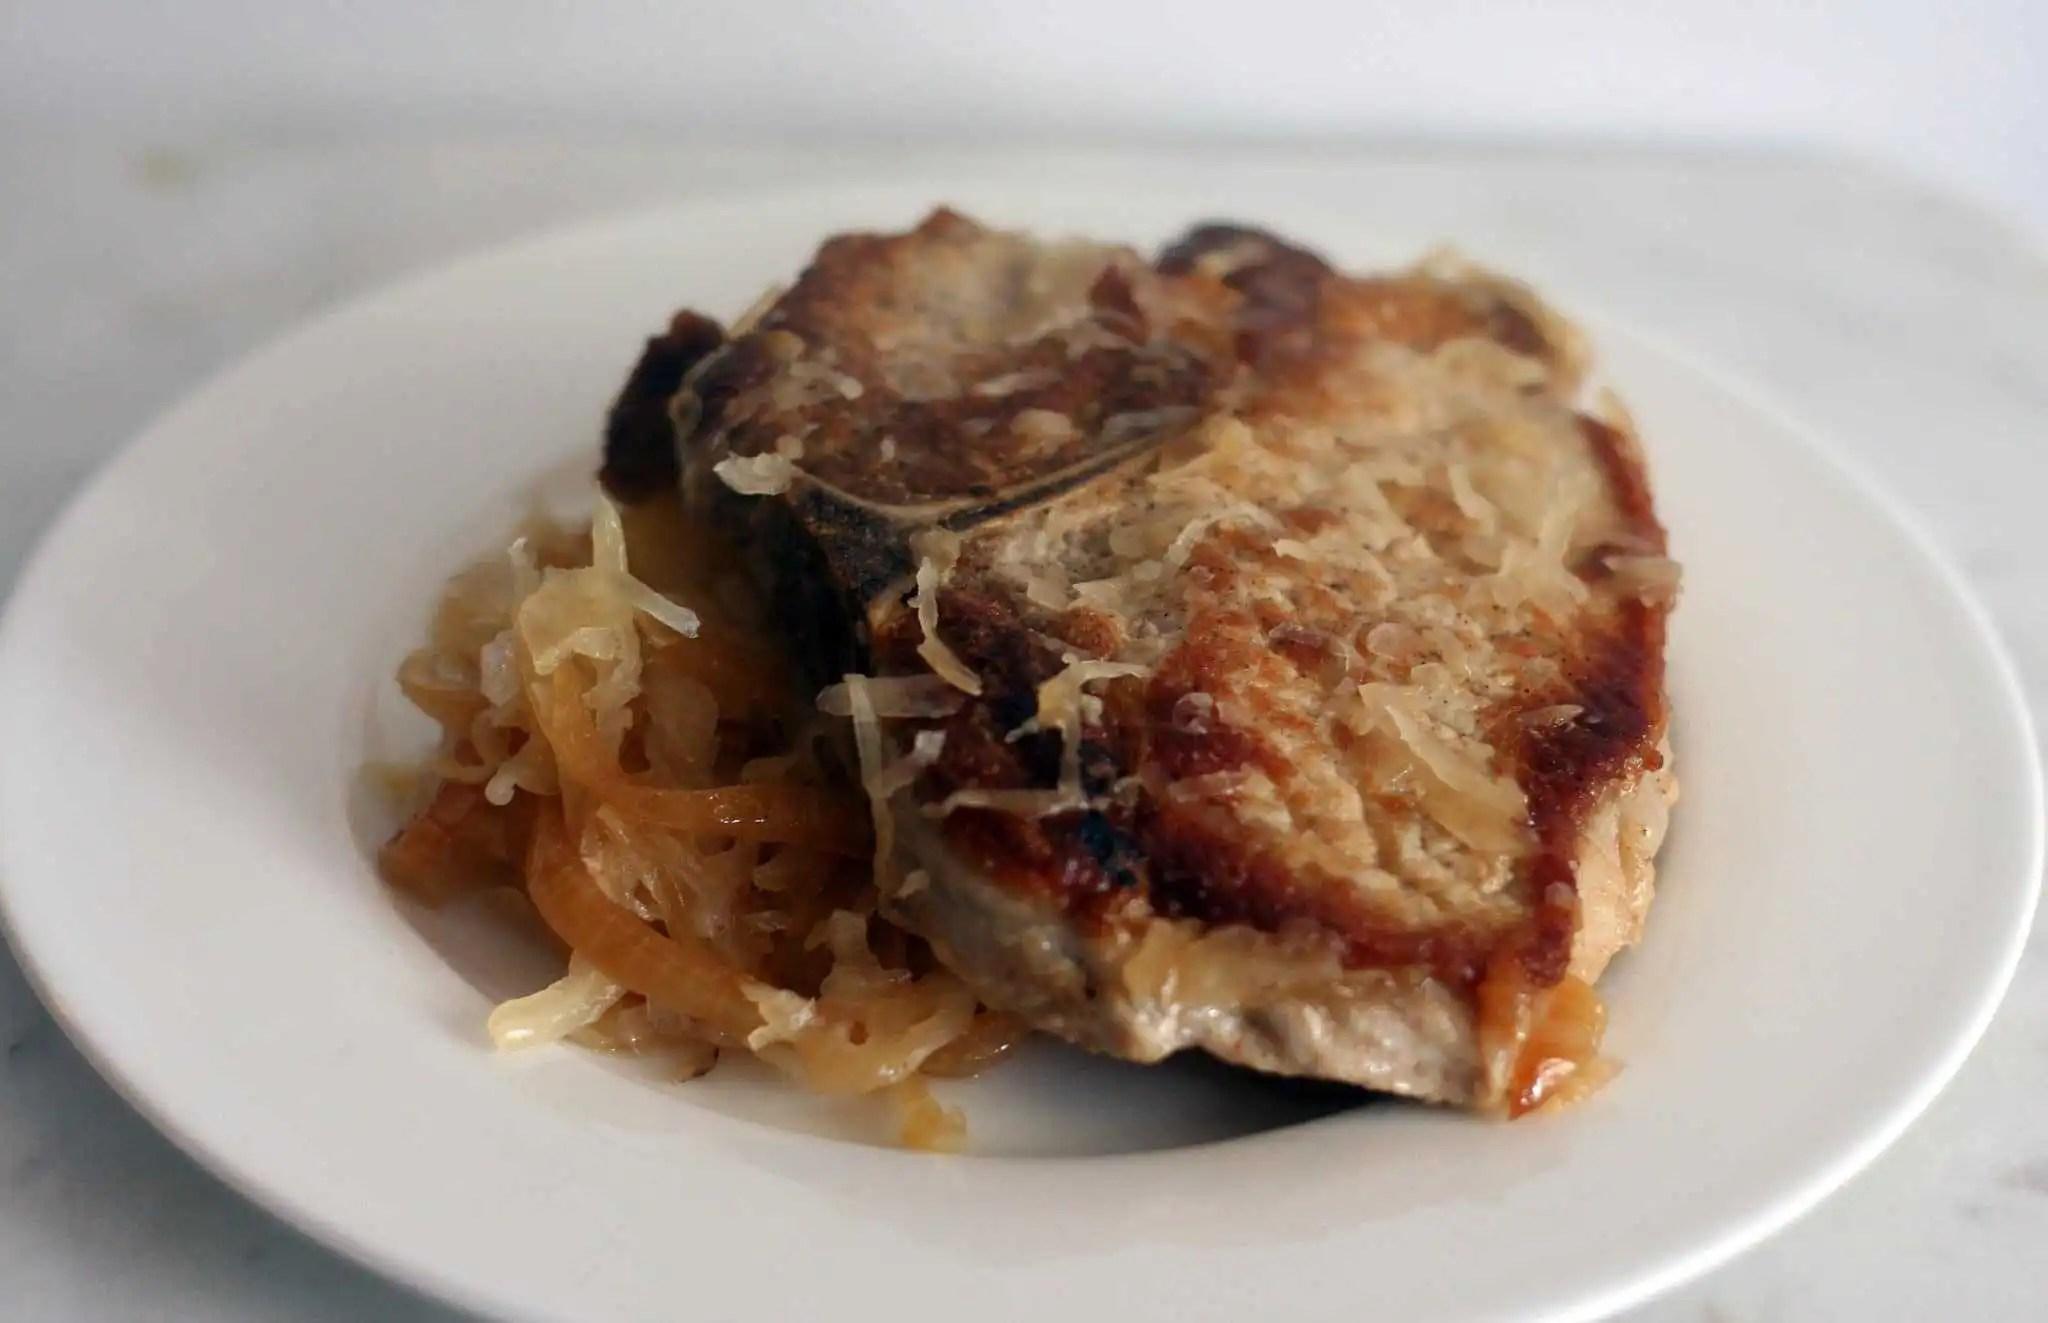 pork chops wit apples and sauerkraut